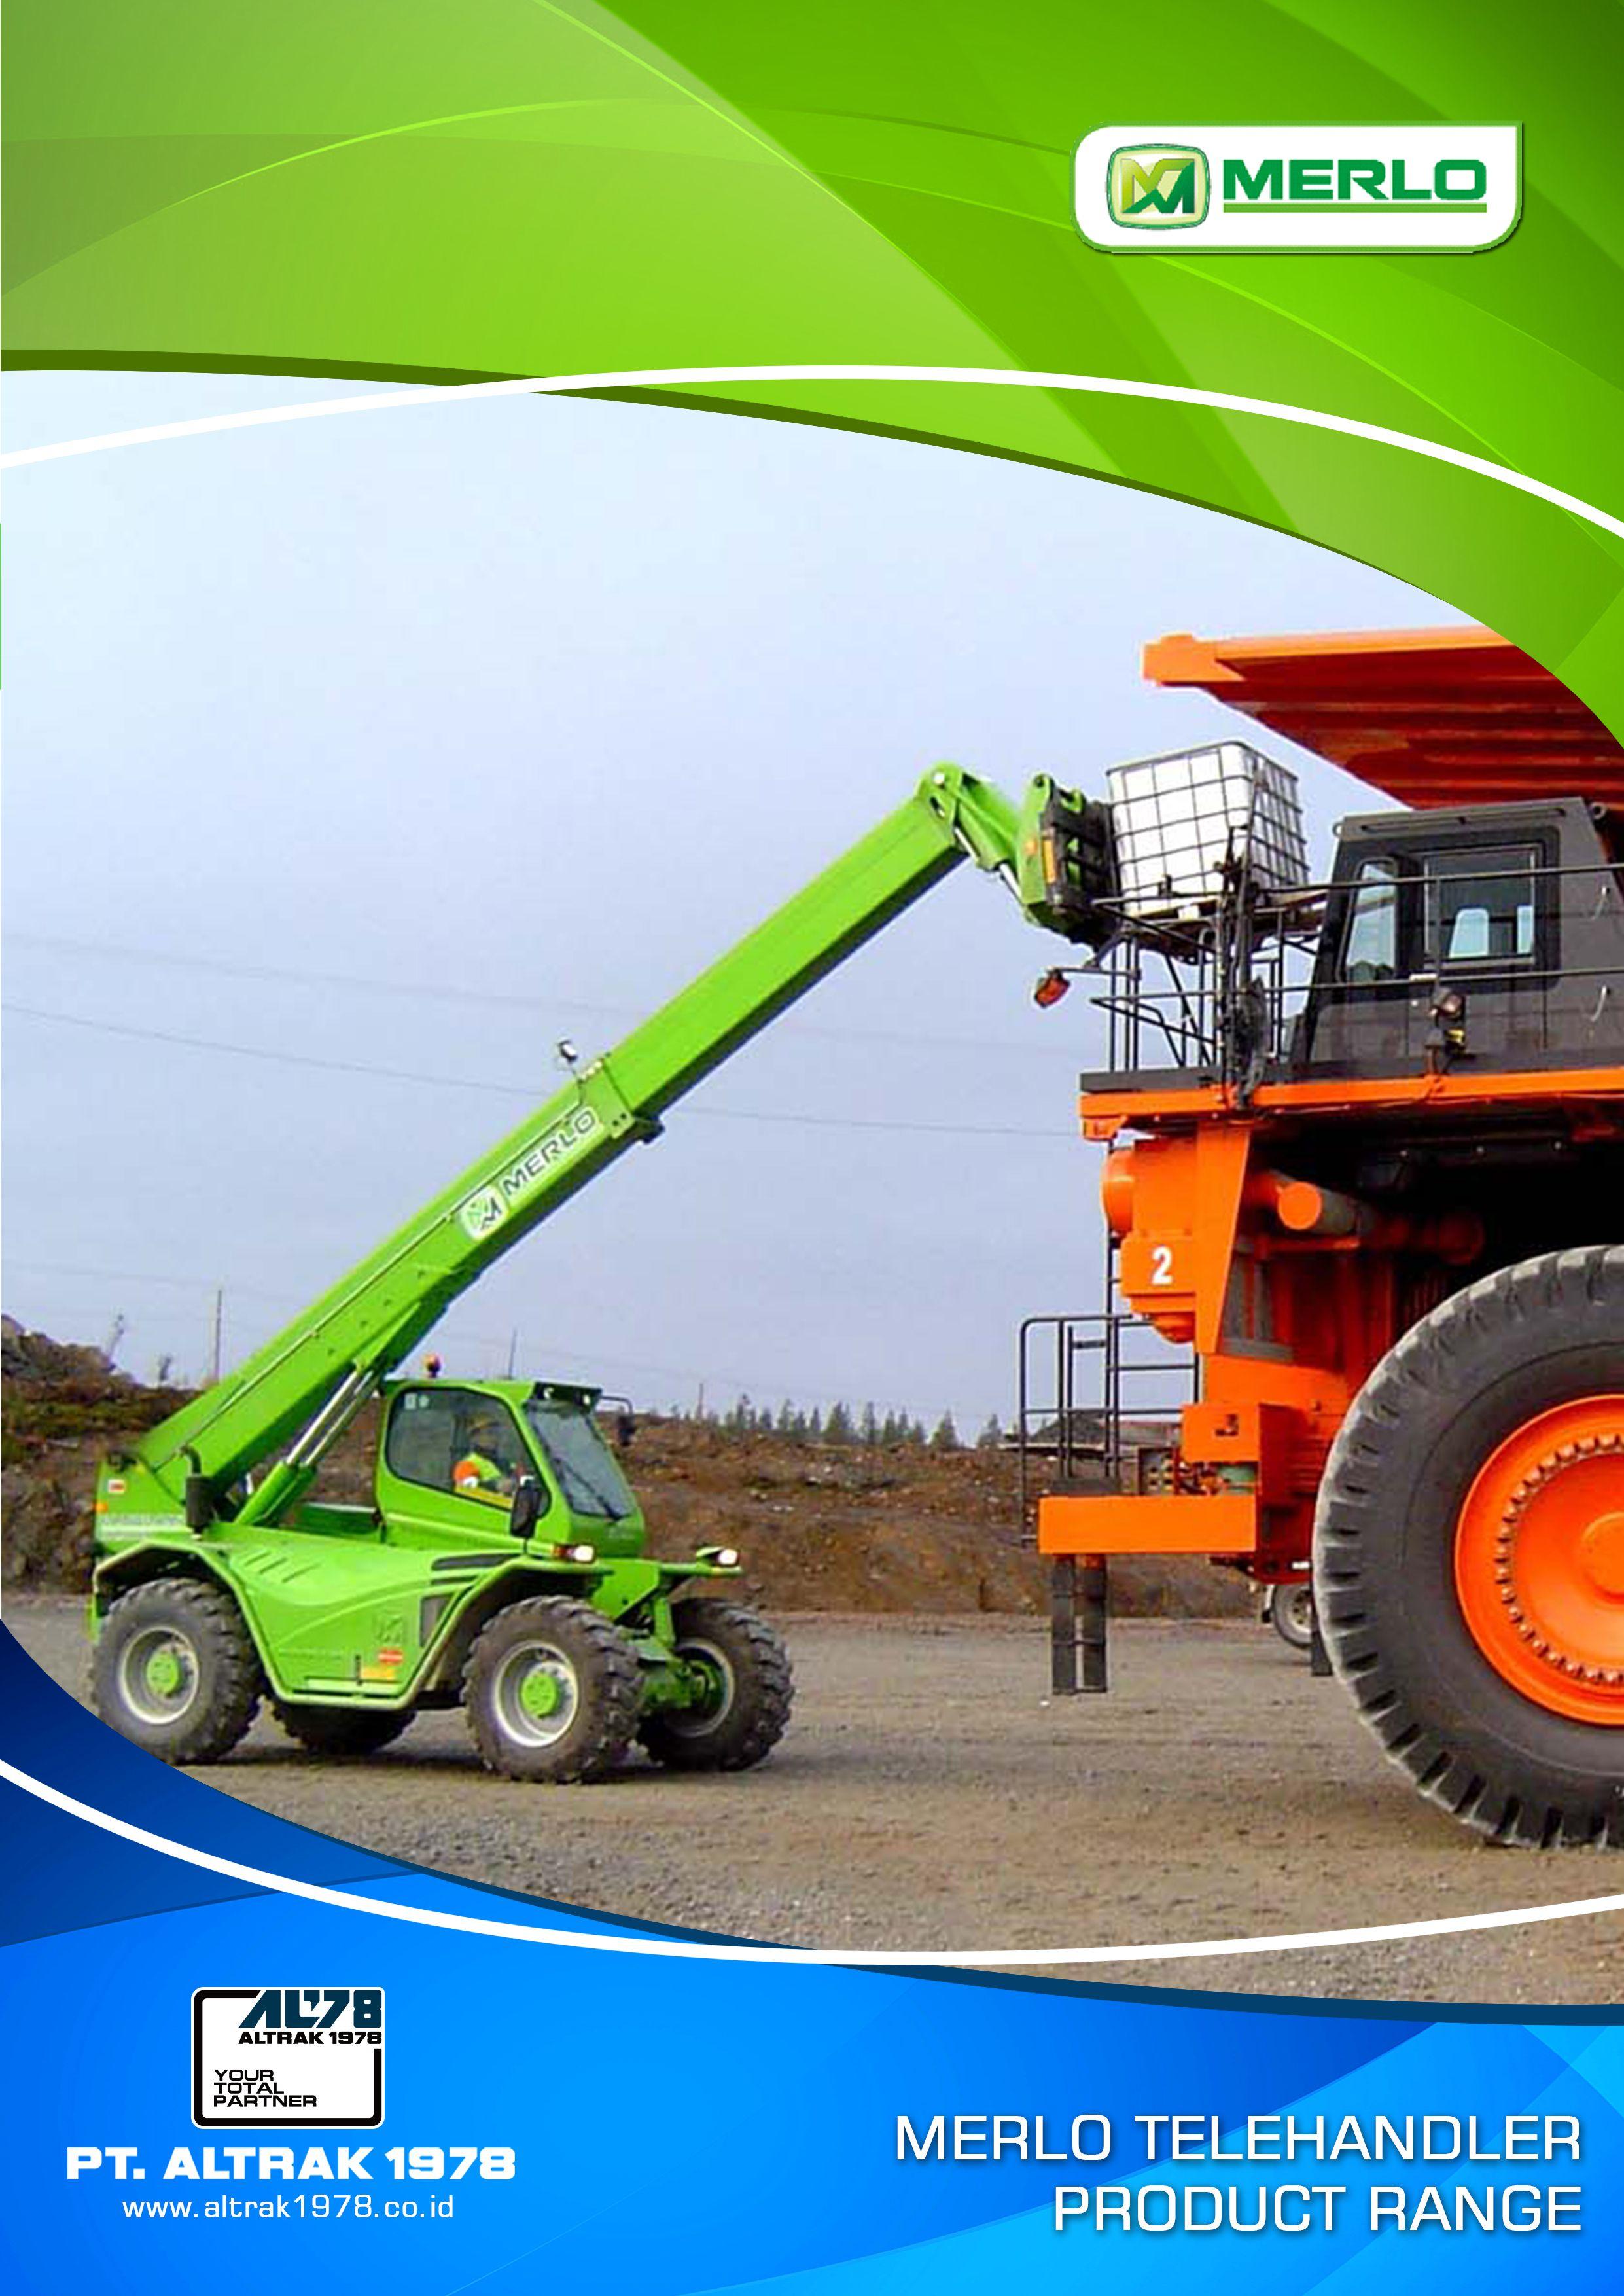 Merlo Telehandler Product Range Front Telehandler Safety Training OSHA &  ANSI Compliant www.scissorlift.training